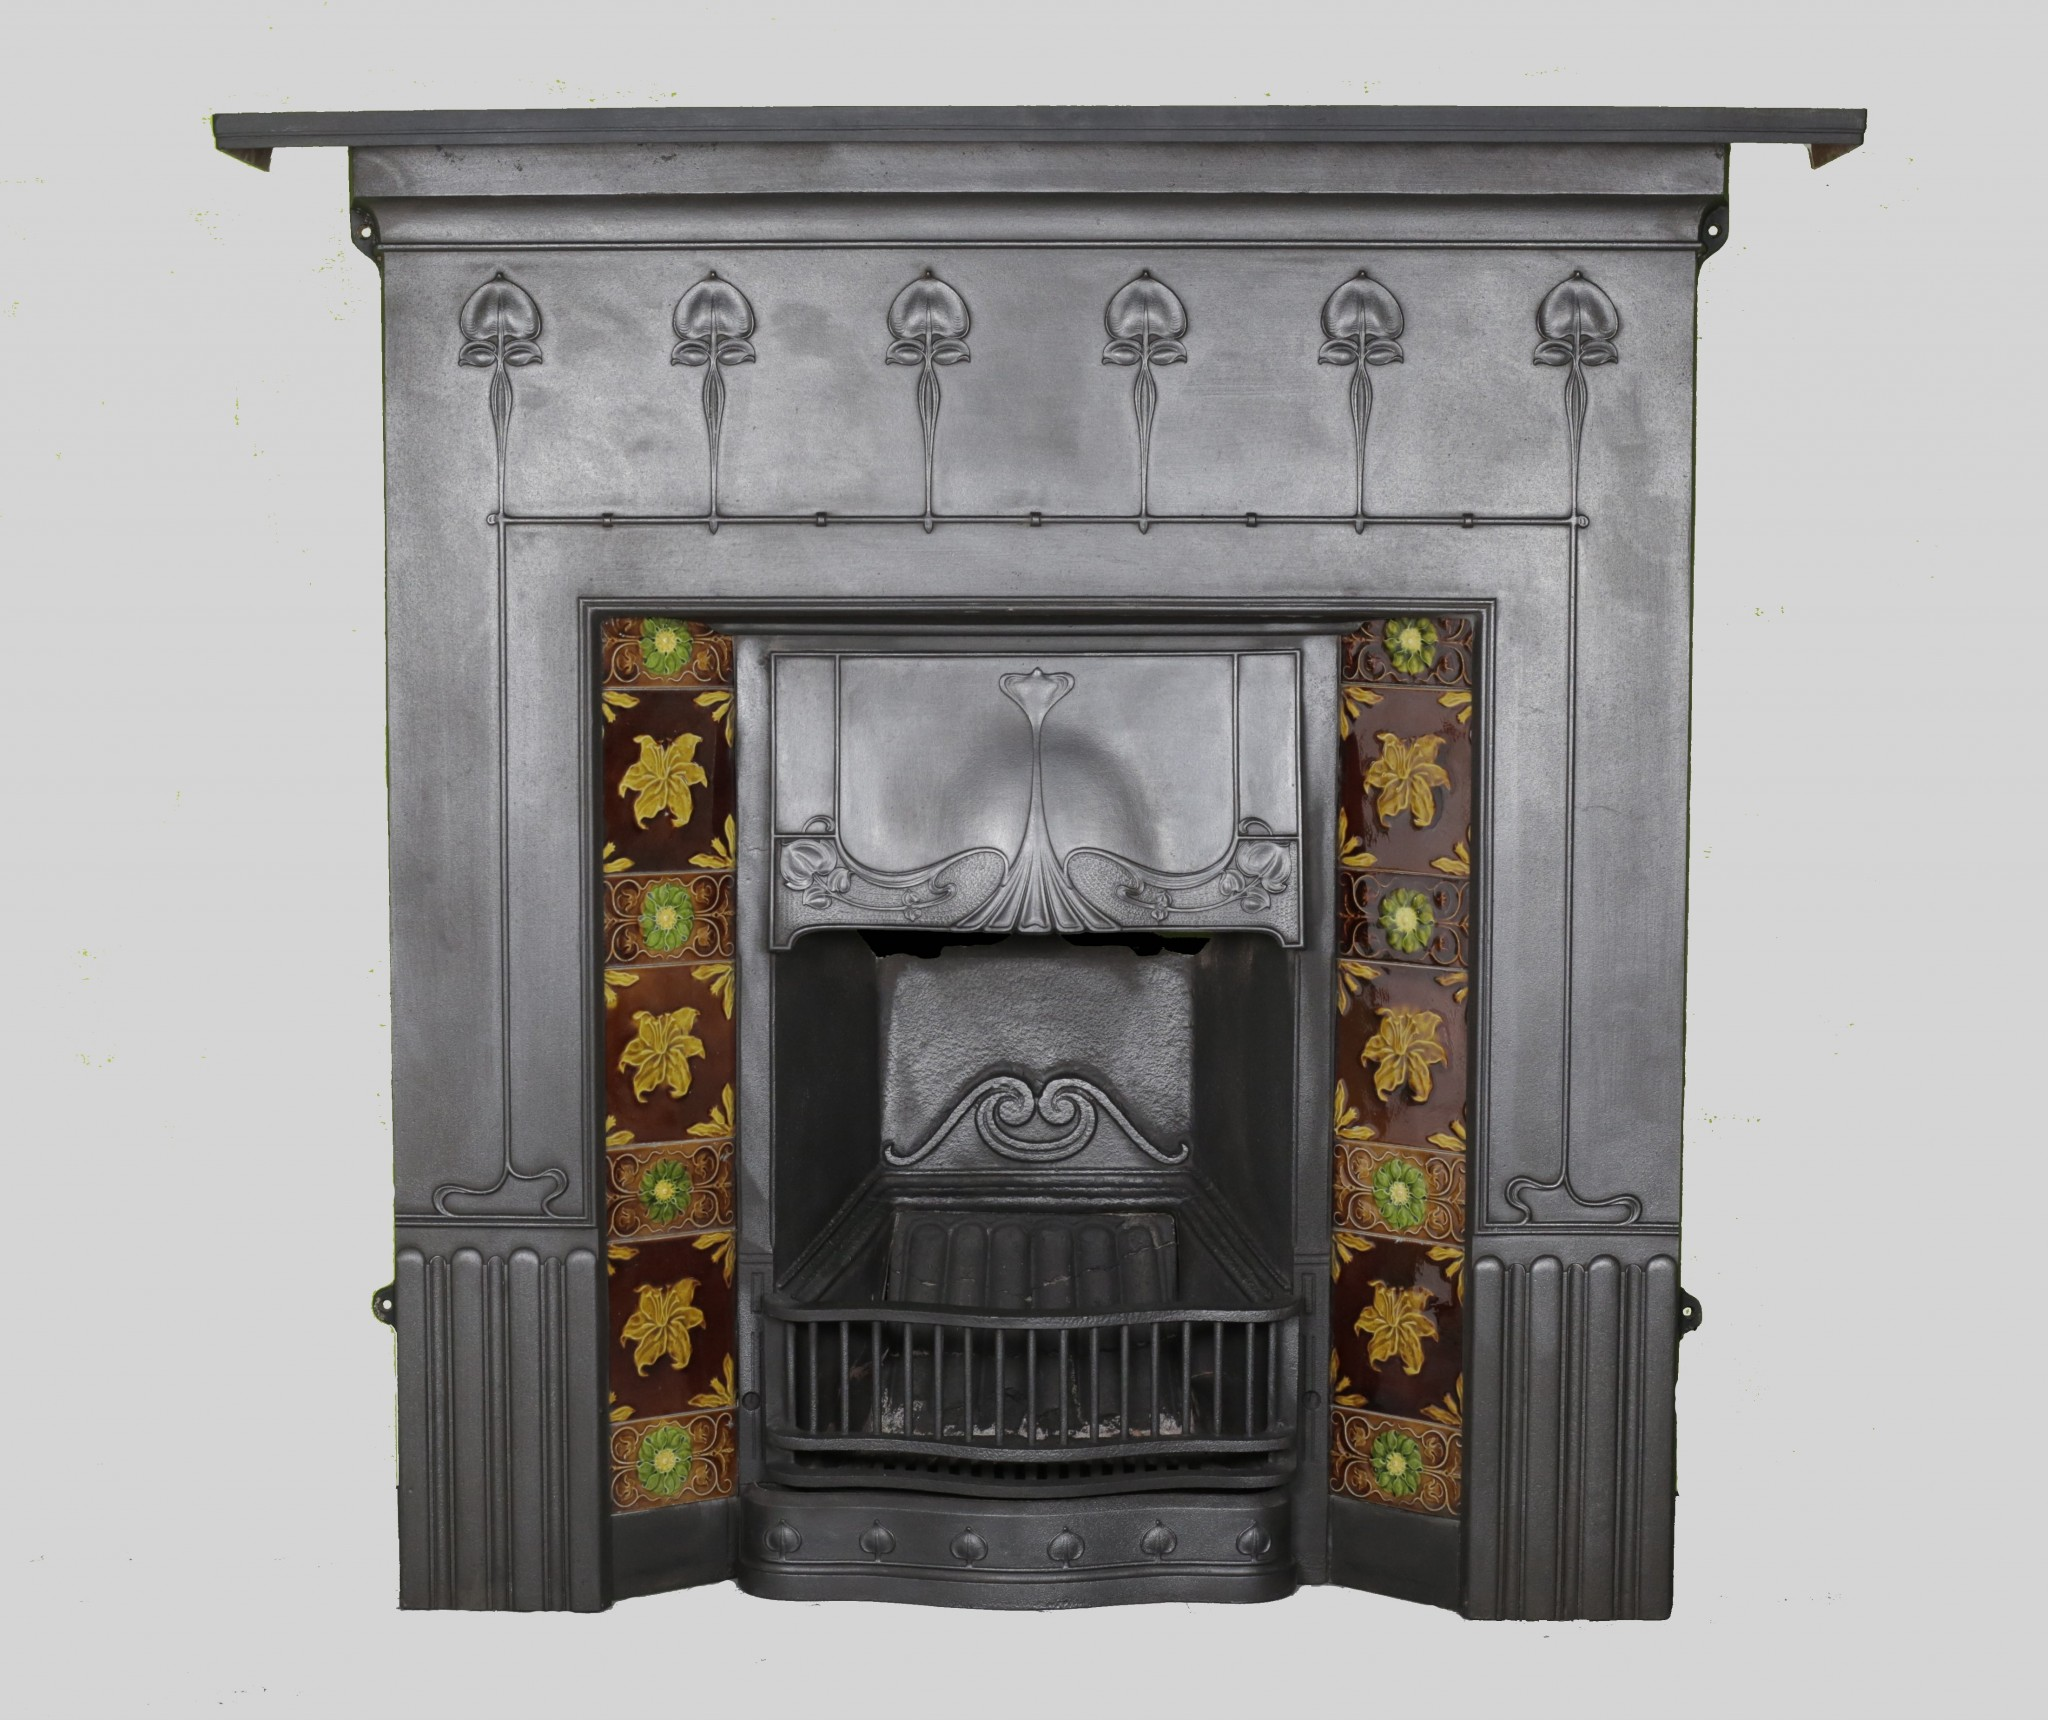 countertops hues tiles antique week tile coastal fireplace